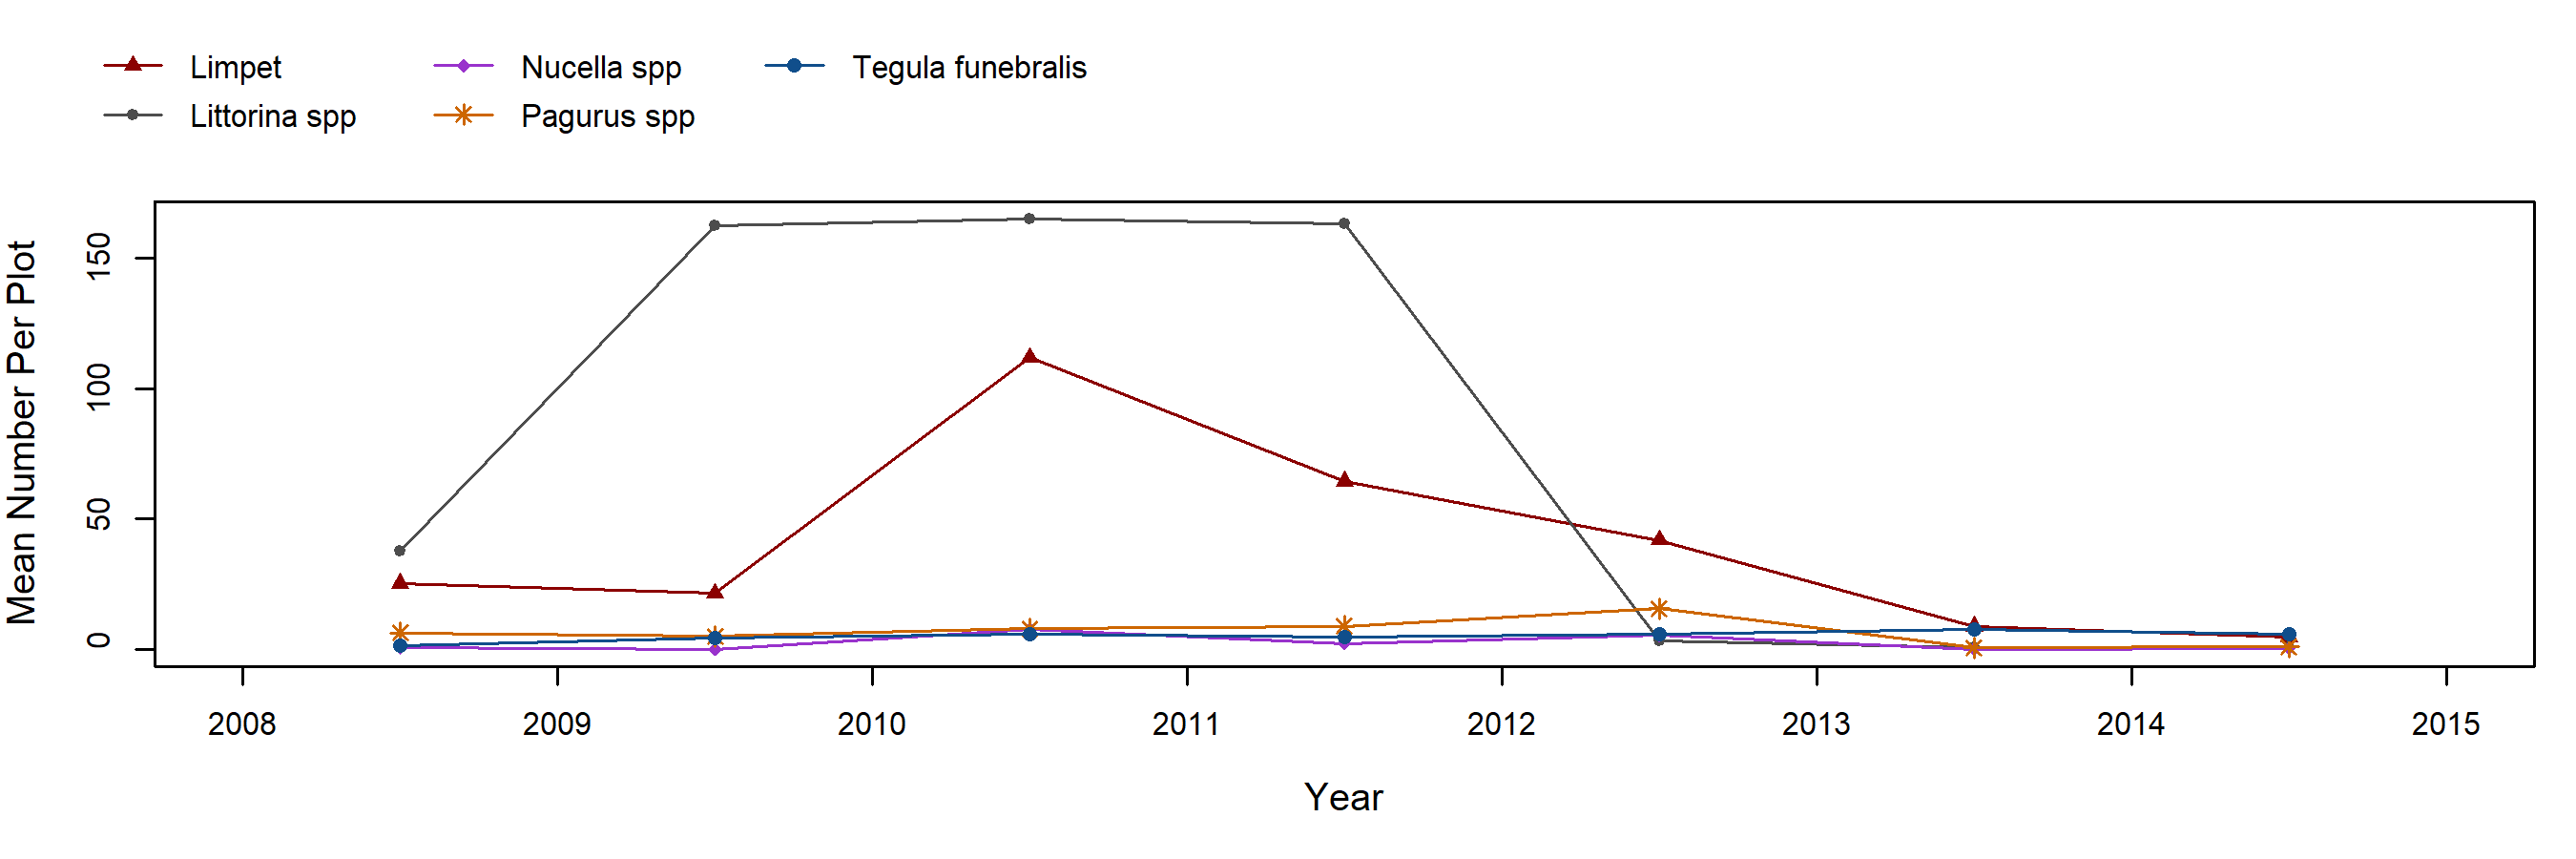 Alcatraz Fucus motiles trend plot